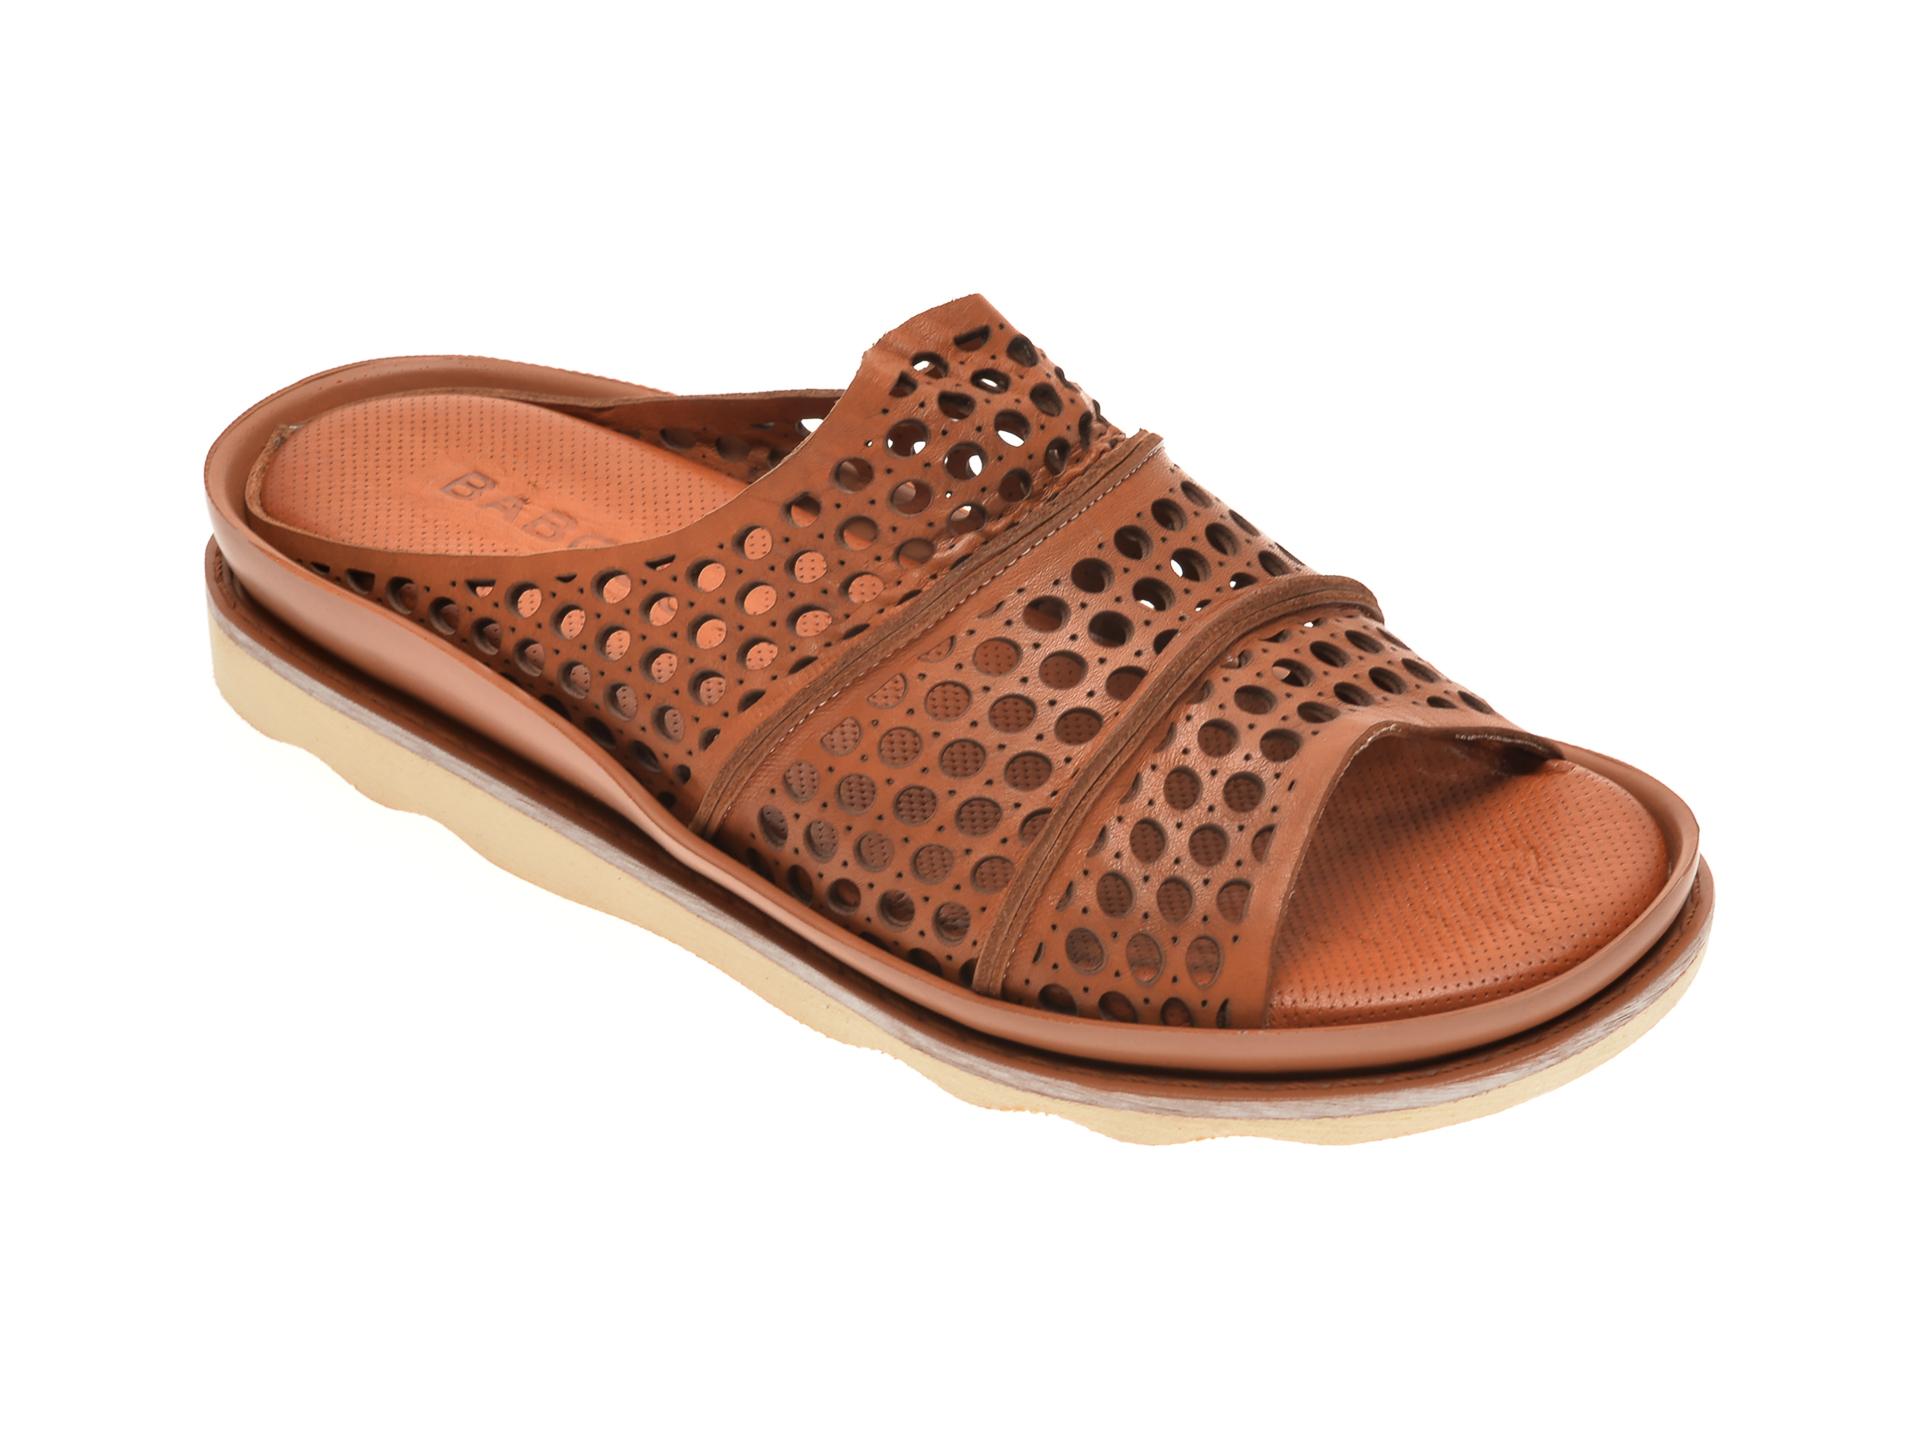 Papuci BABOOS maro, 0405, din piele naturala